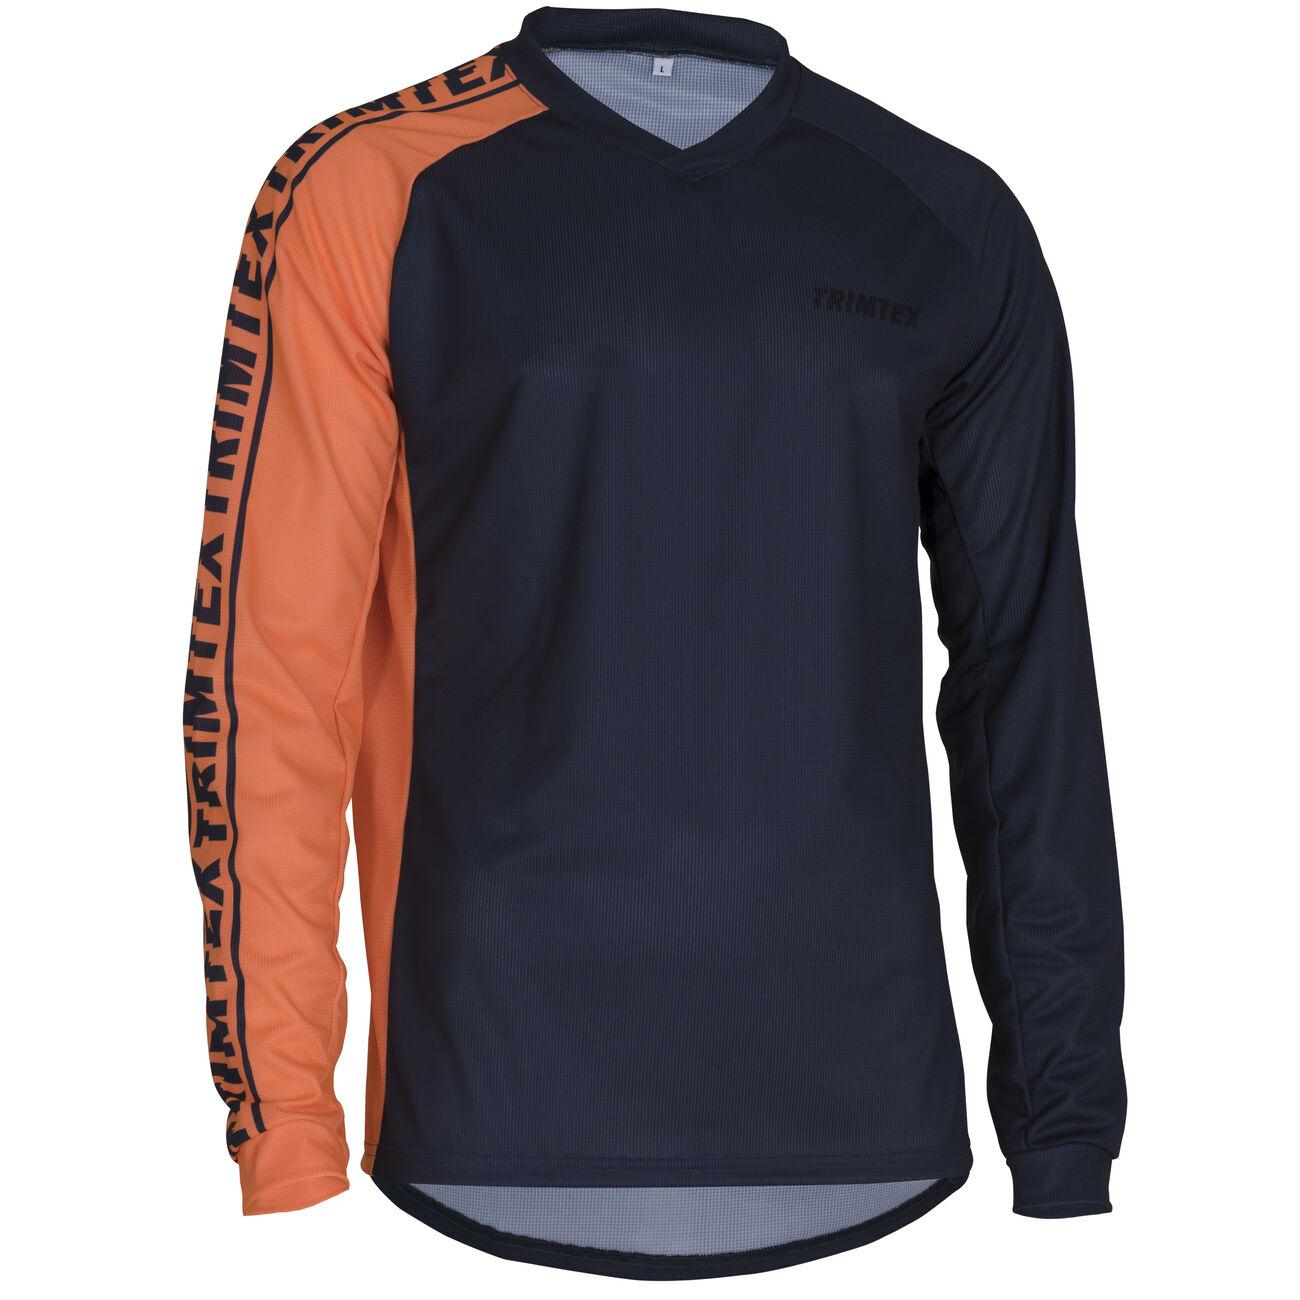 Enduro shirt jersey junior